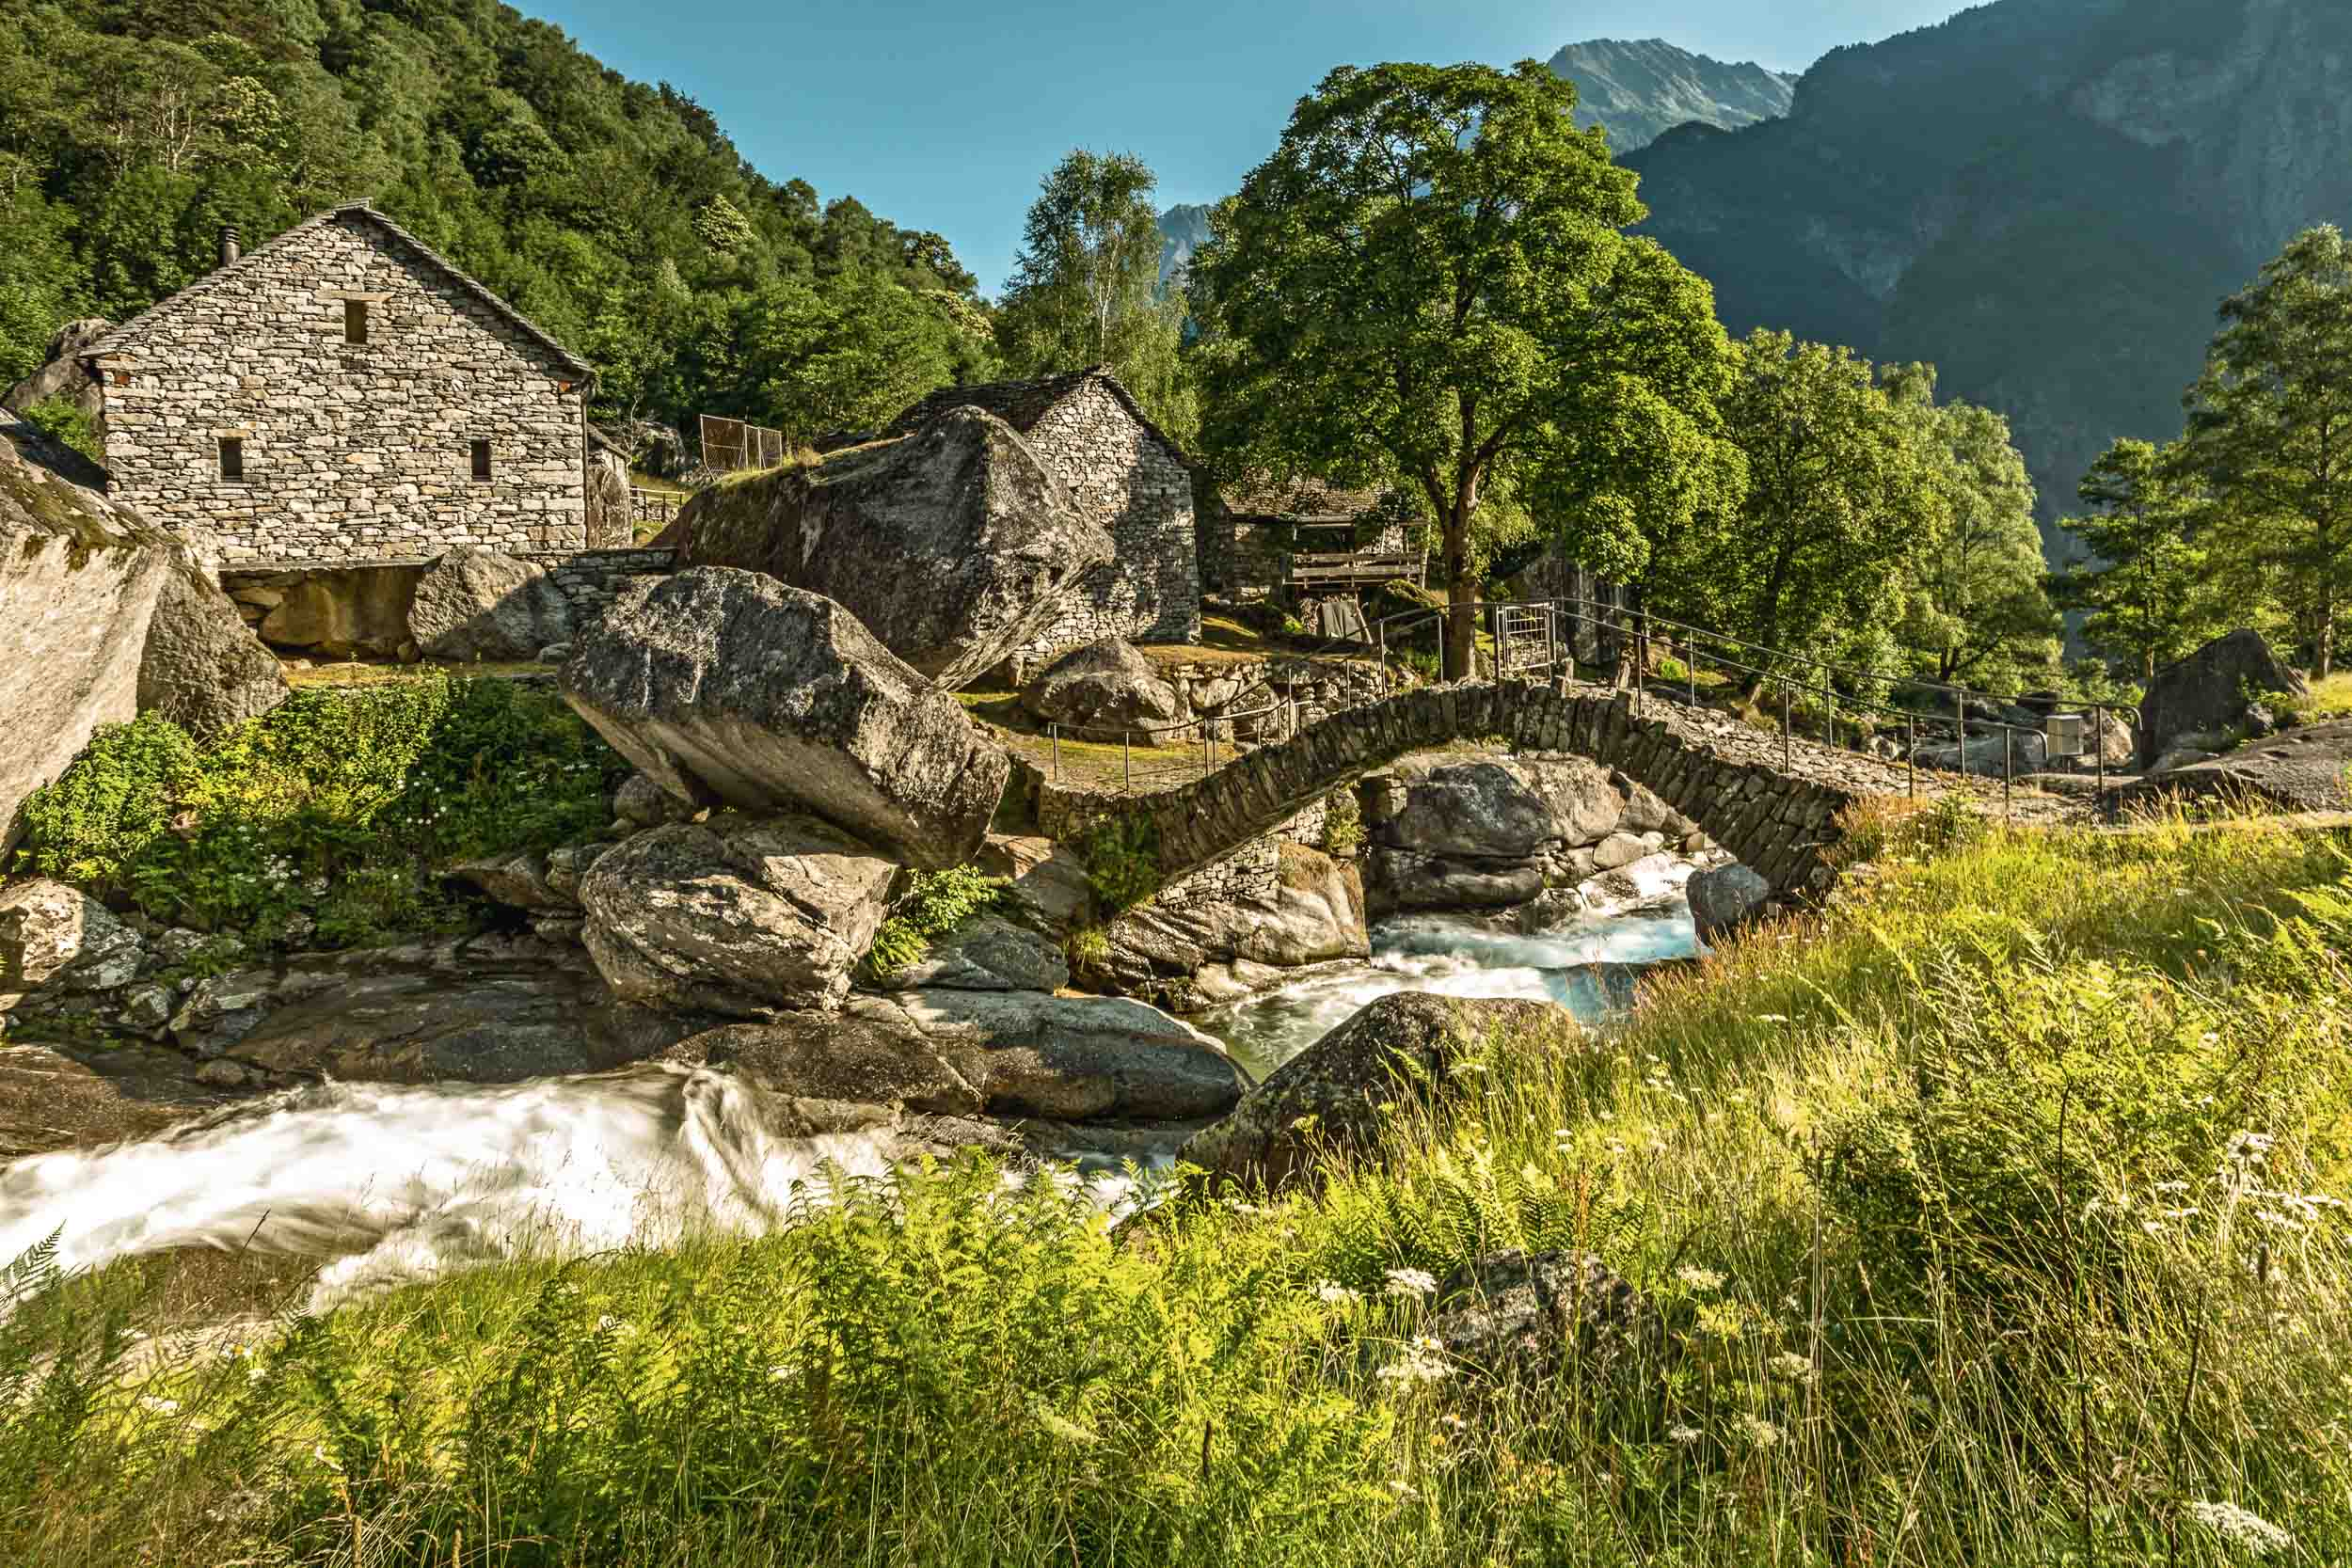 Historic bridge in Puntid, Bavona valley, Cevio.  Copyright by: Switzerland Tourism